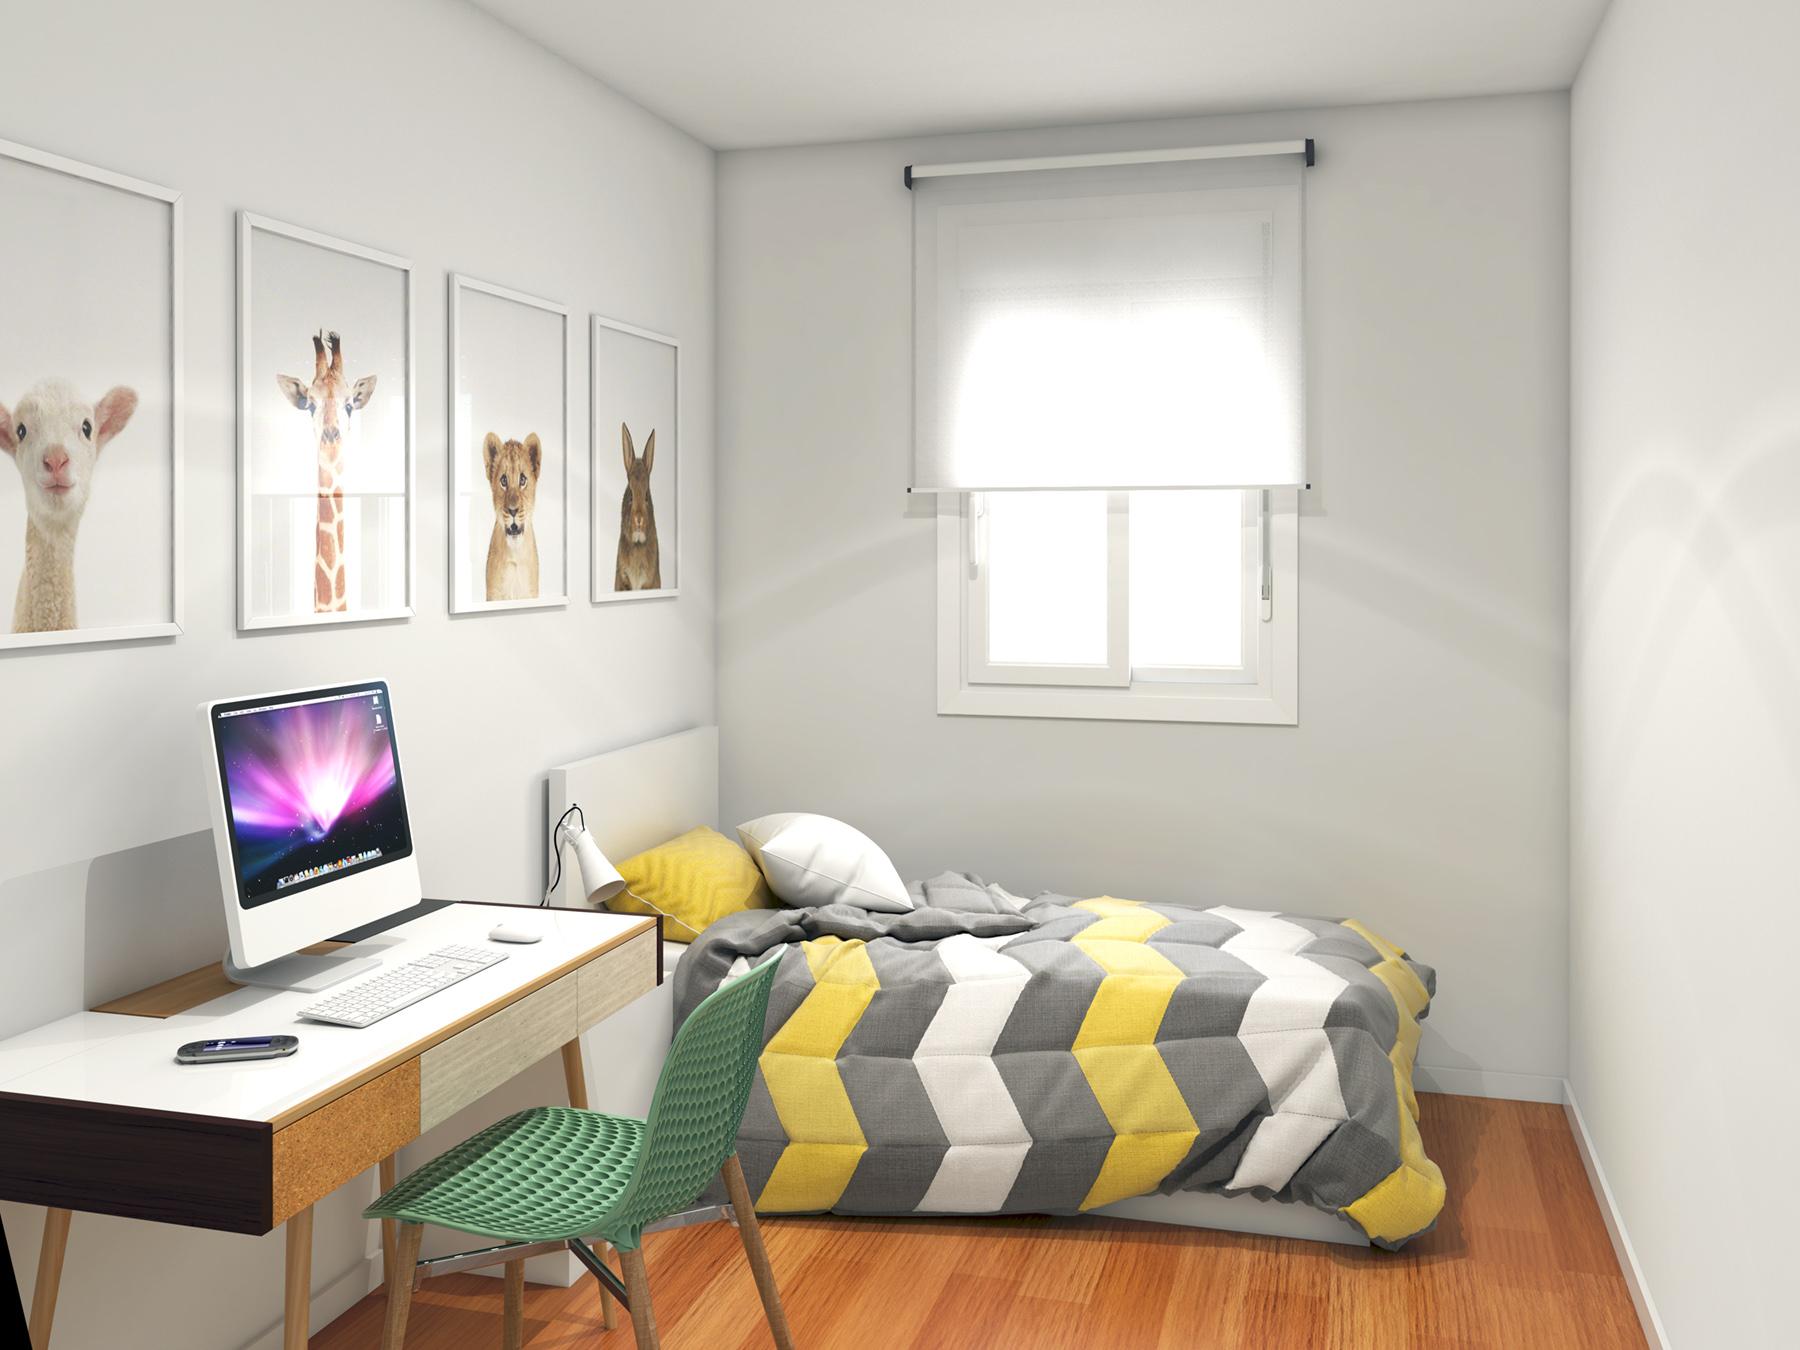 Modelado texturizado e iluminaci n habitaci n 3d - Iluminacion habitacion ...